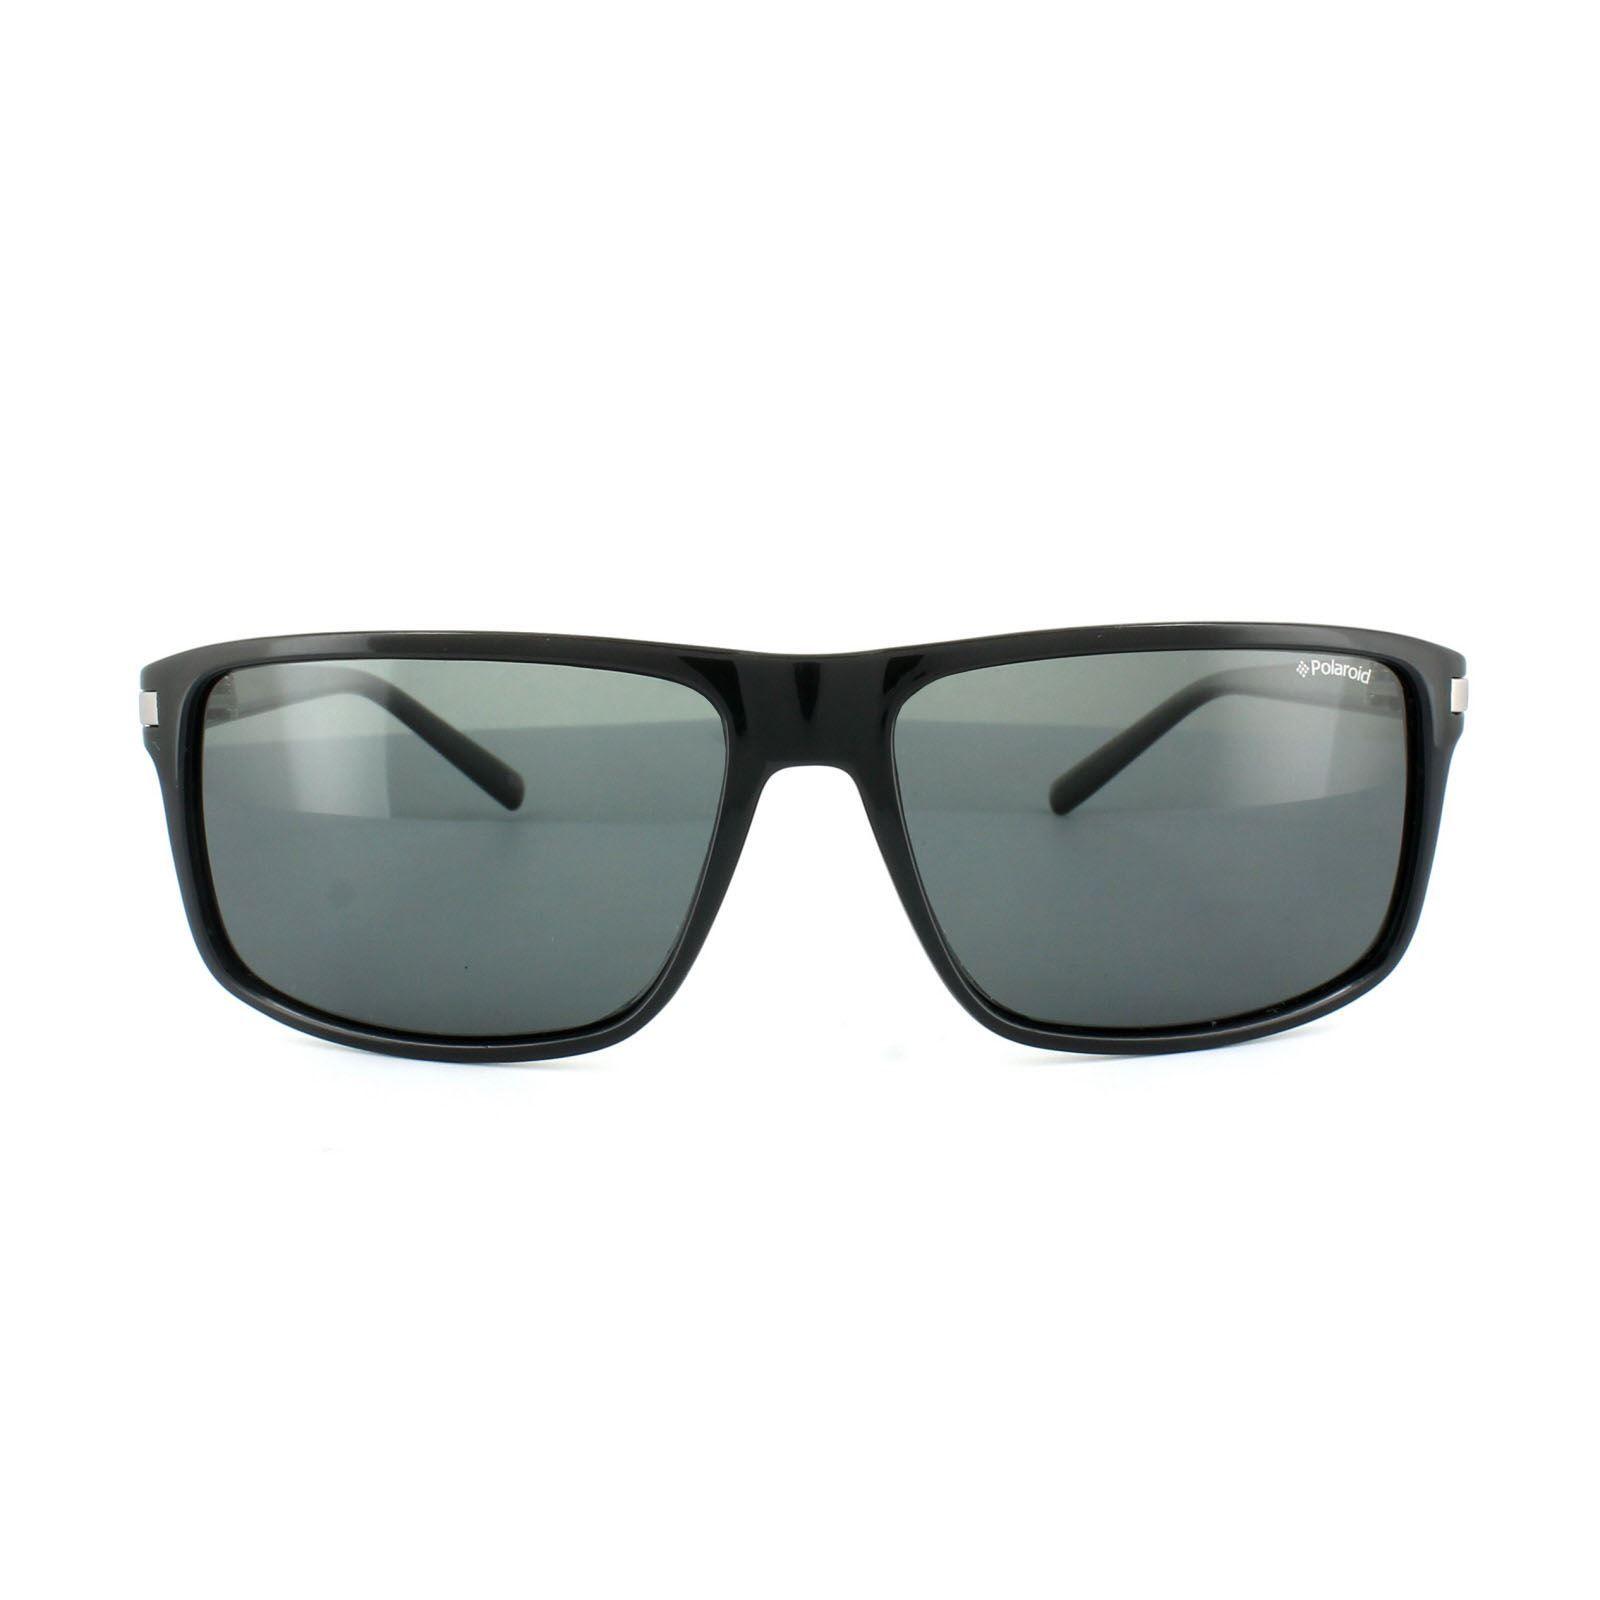 Polaroid Sunglasses 2019/S D28 Y2 Black Grey Polarized